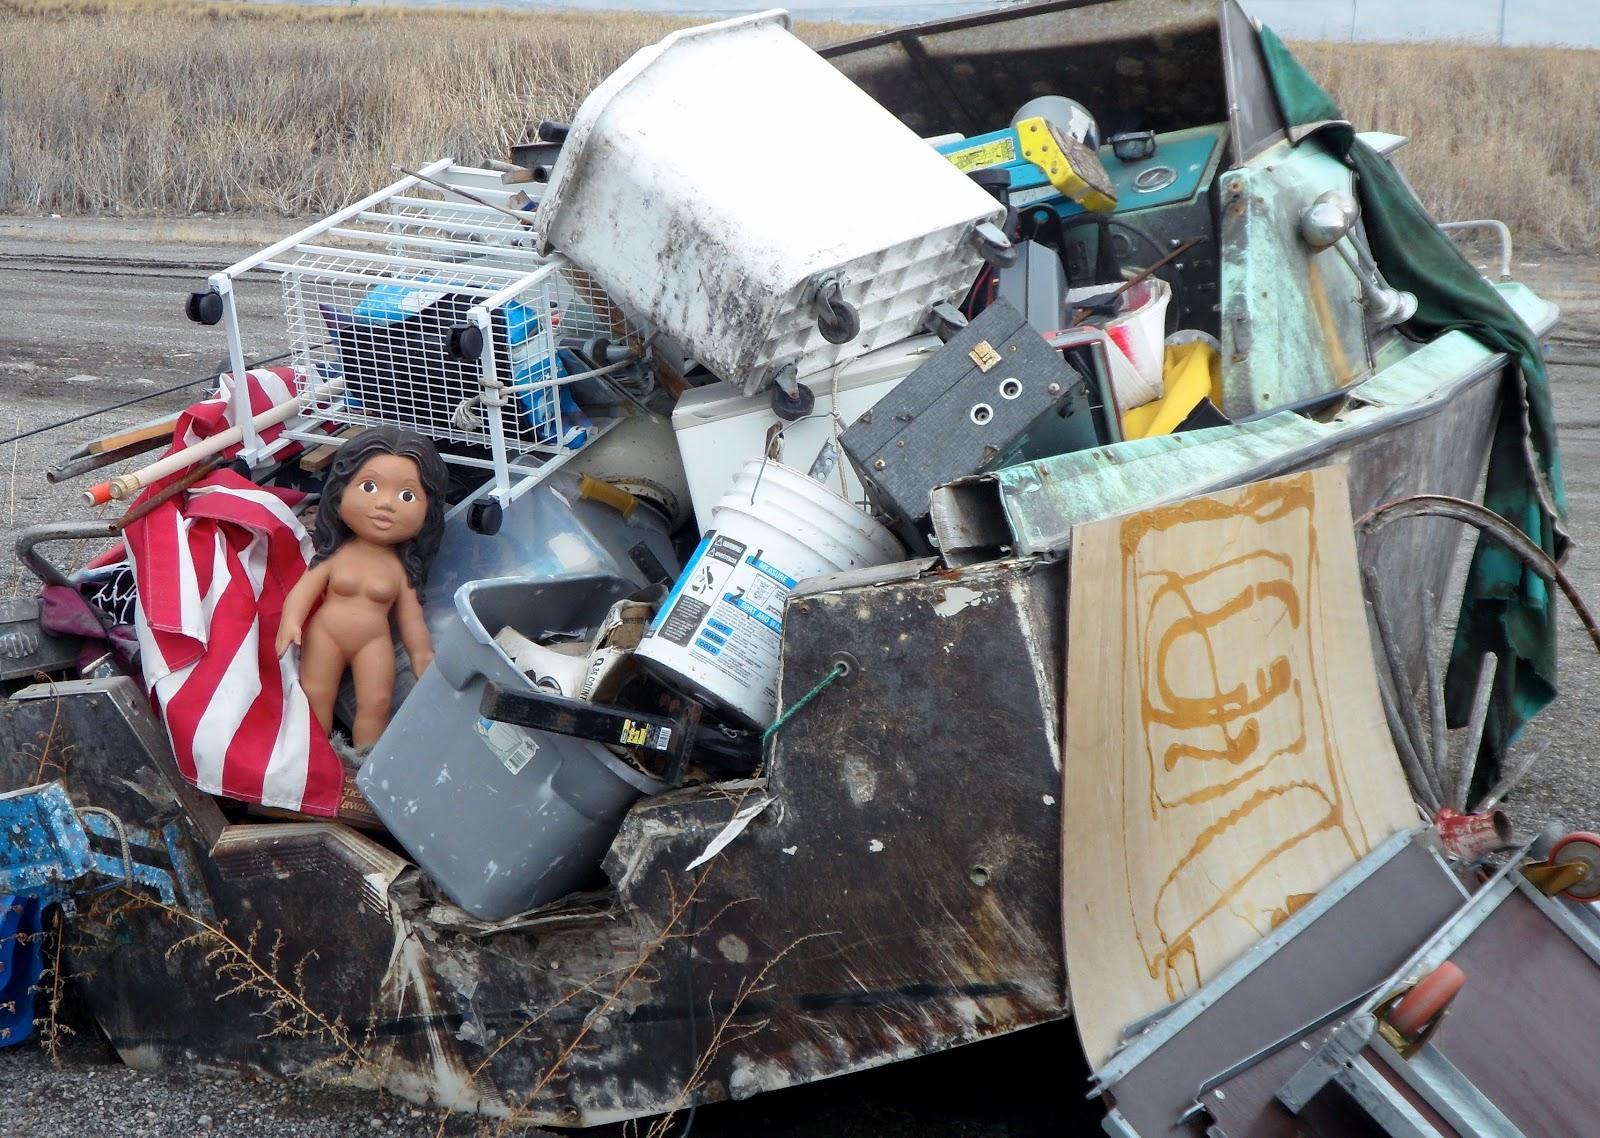 Wrecking Yards Tacoma Wa : Military junk yards in washington autos post